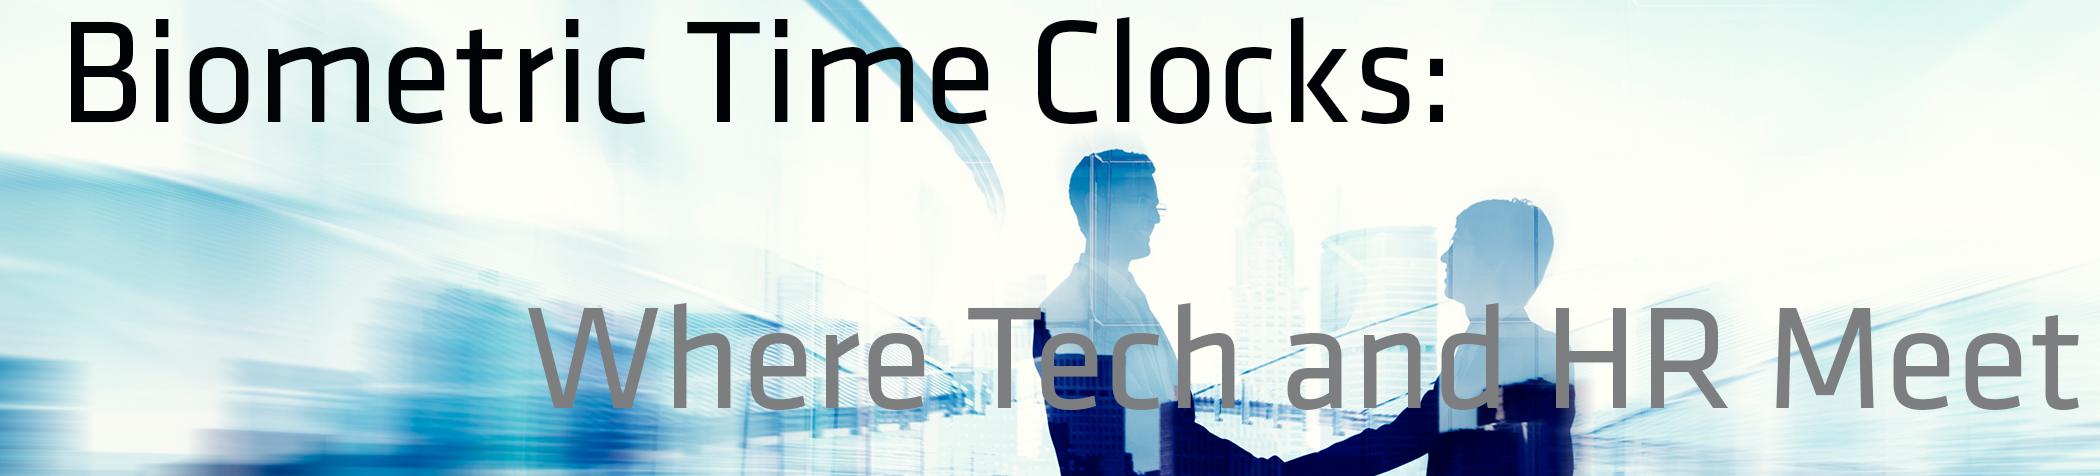 biometric time clocks banner